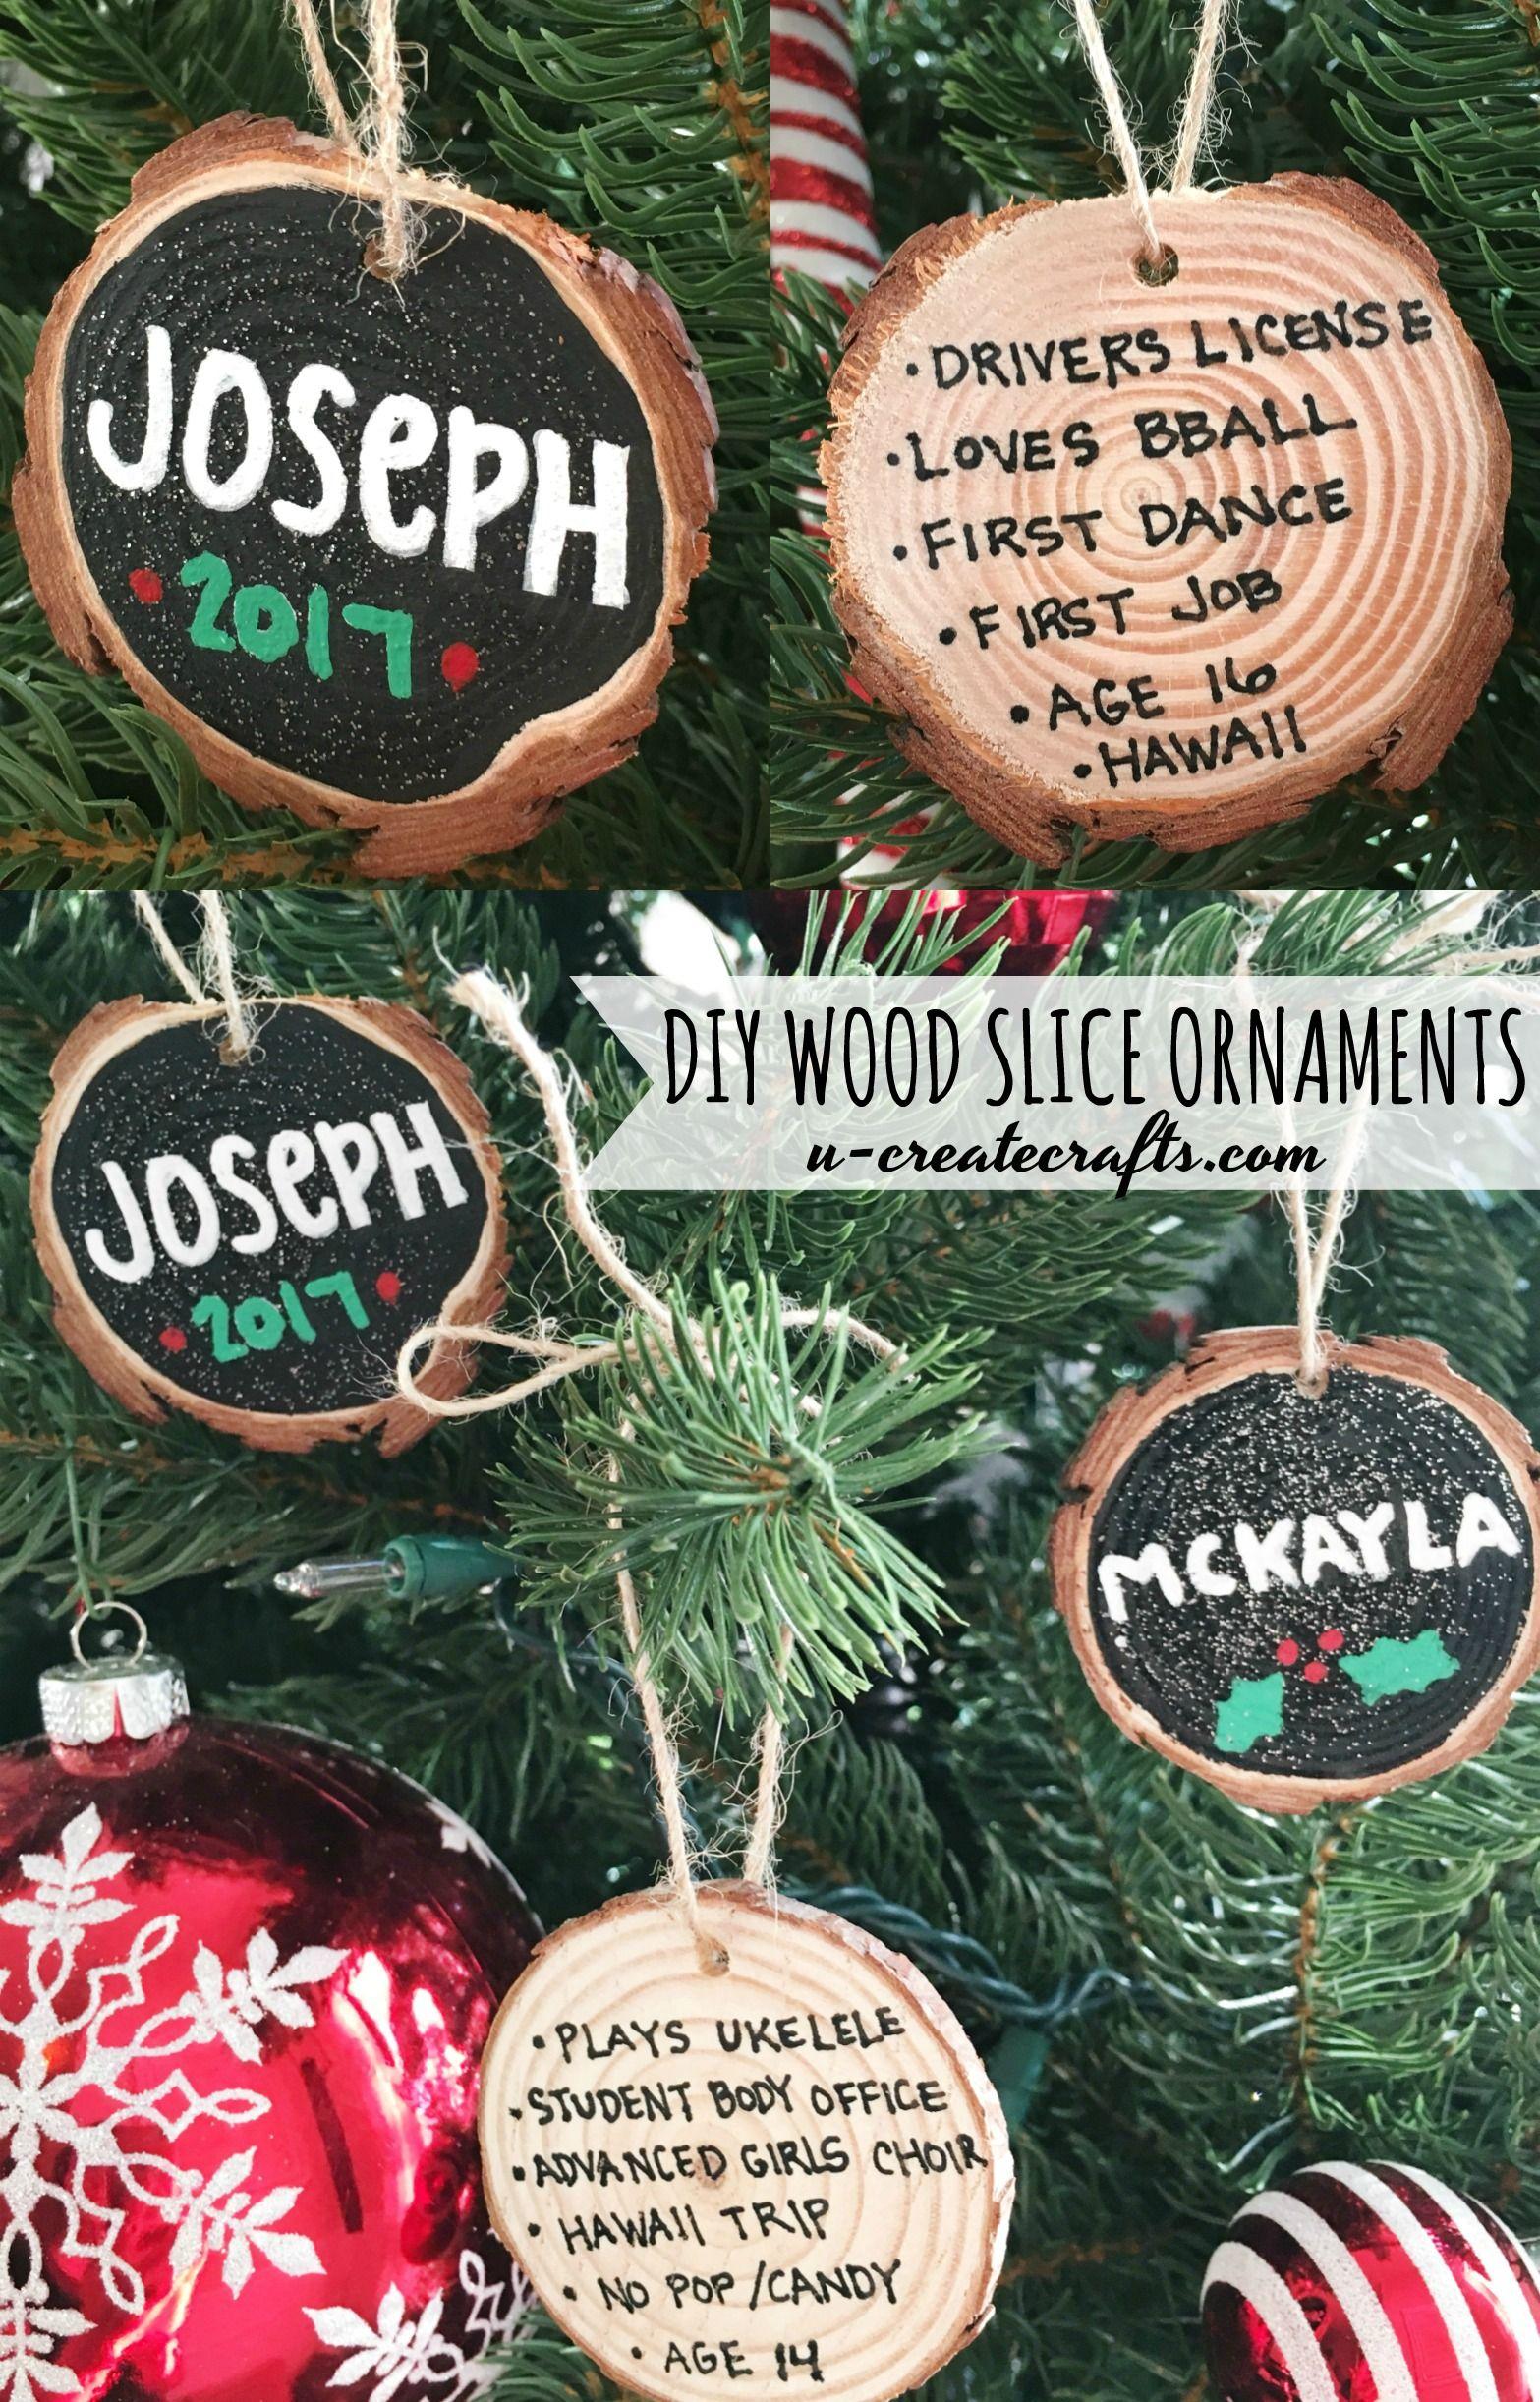 Diy Wood Slice Ornaments U Create Family Christmas Ornaments Diy Christmas Ornaments Wood Christmas Ornaments